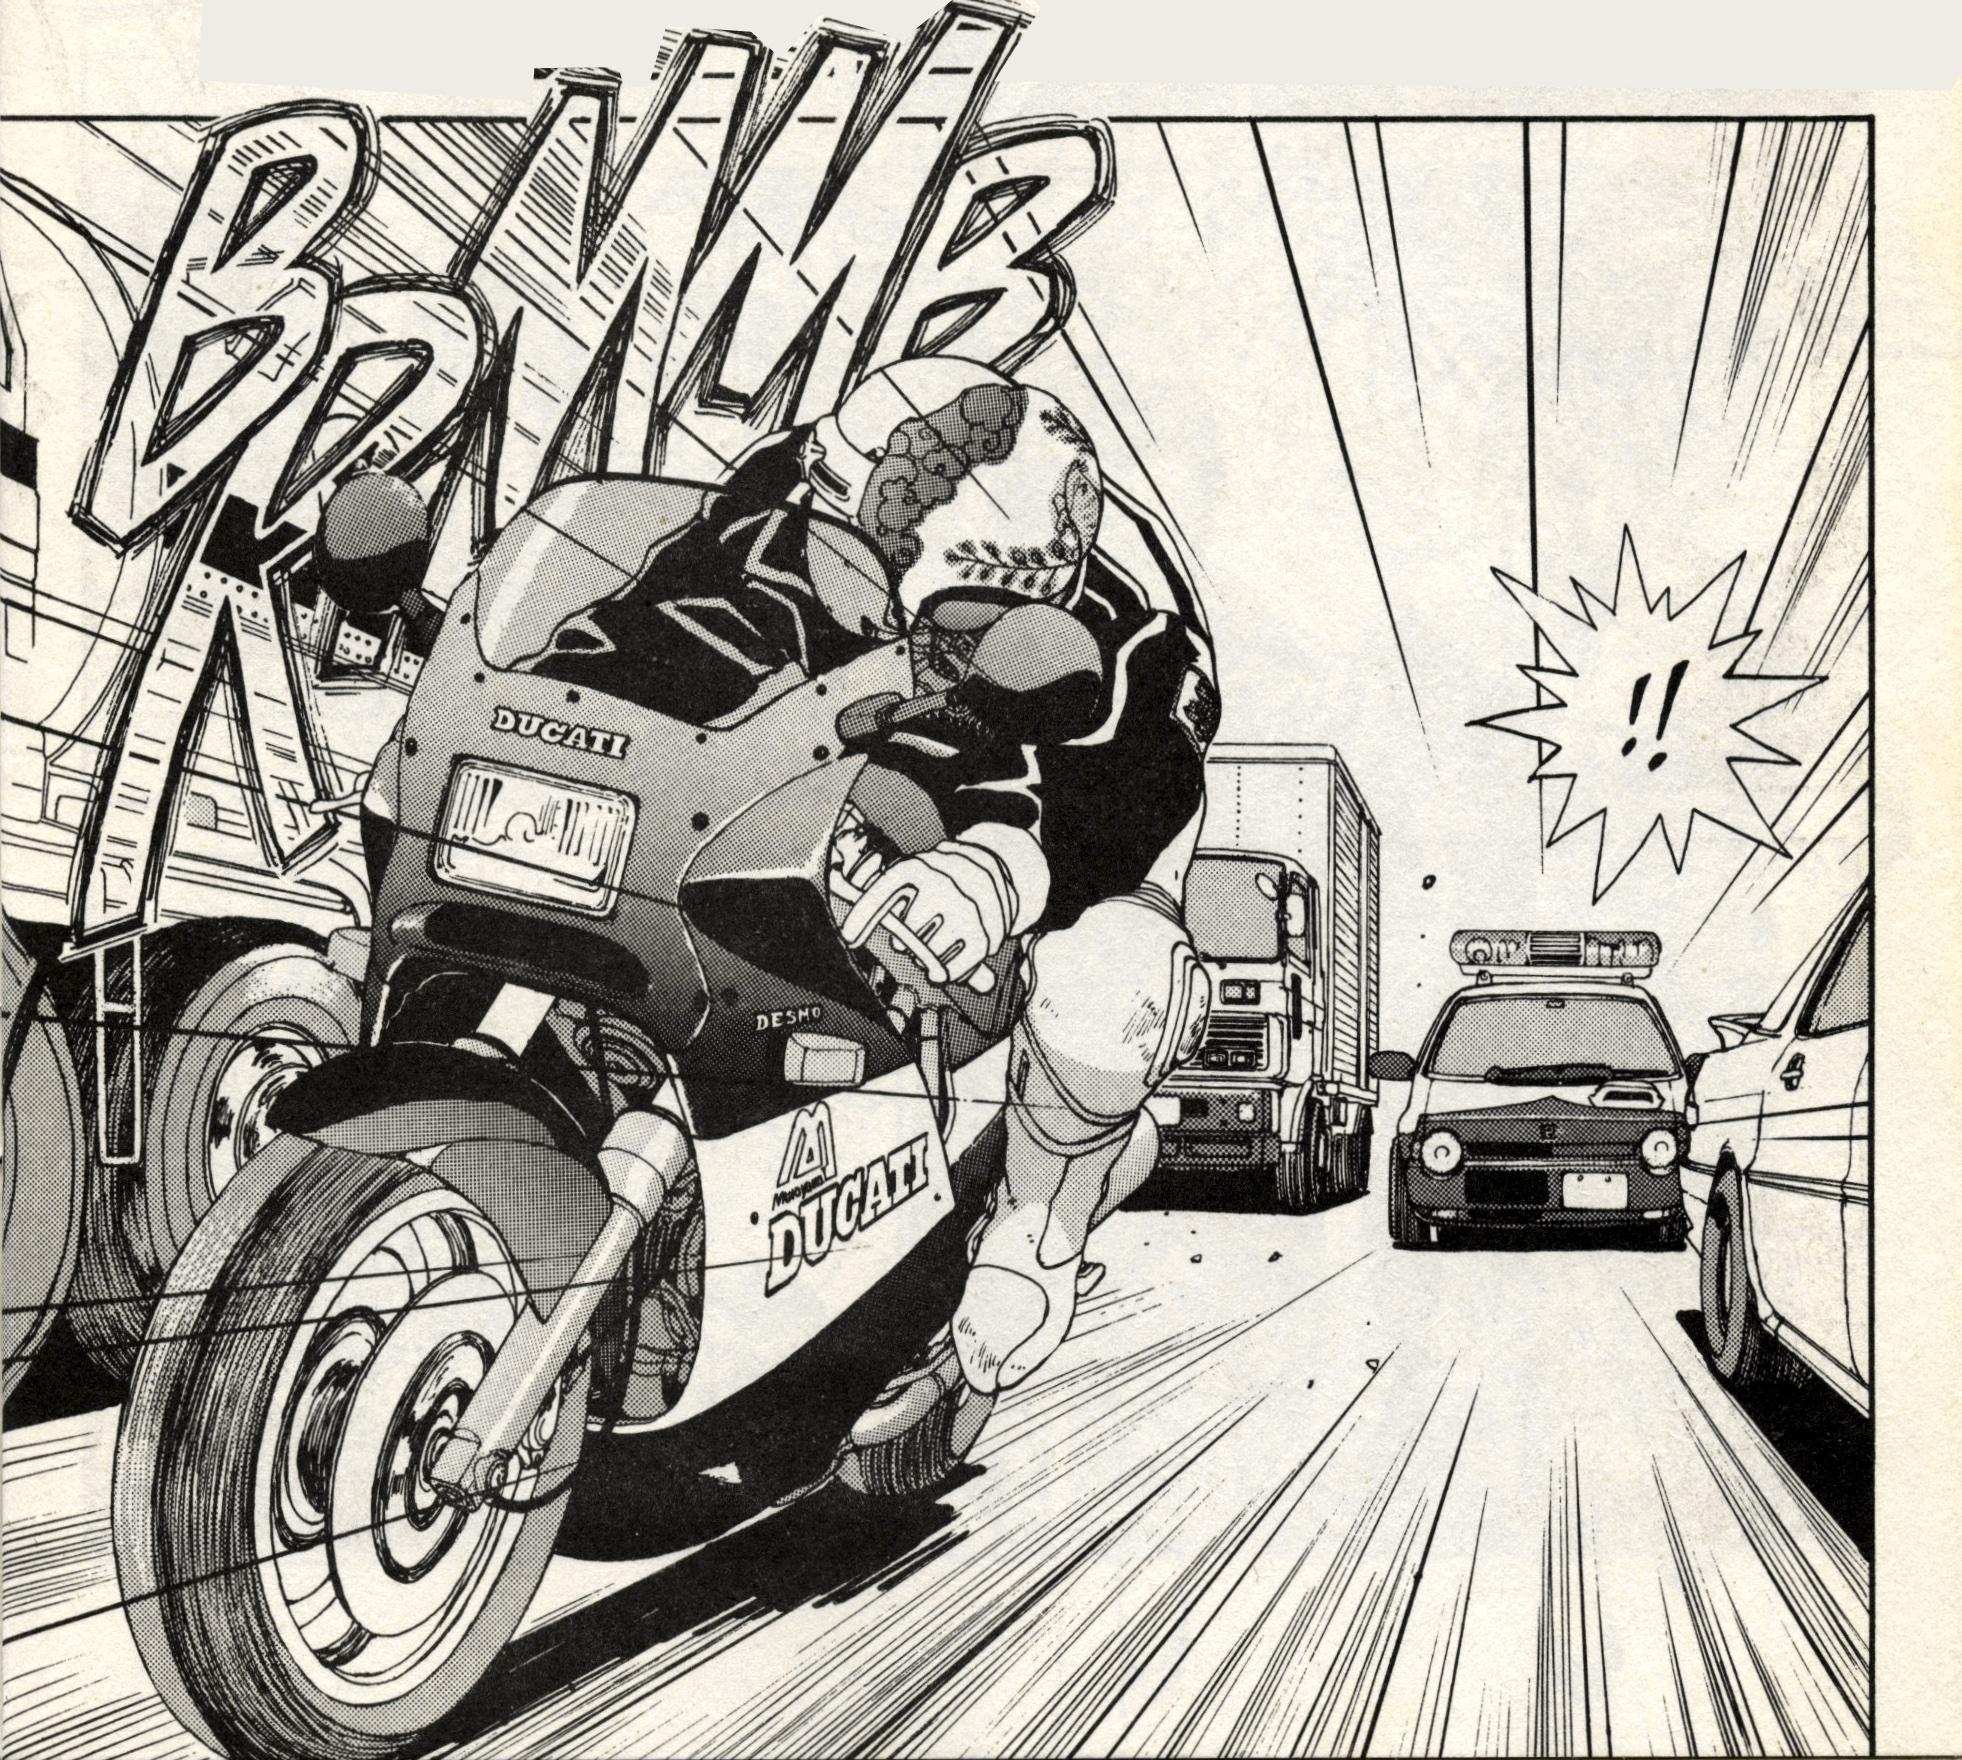 youre-under-arrest-manga-4-page-03-nissan-sunny-rz-1-nissan-condor